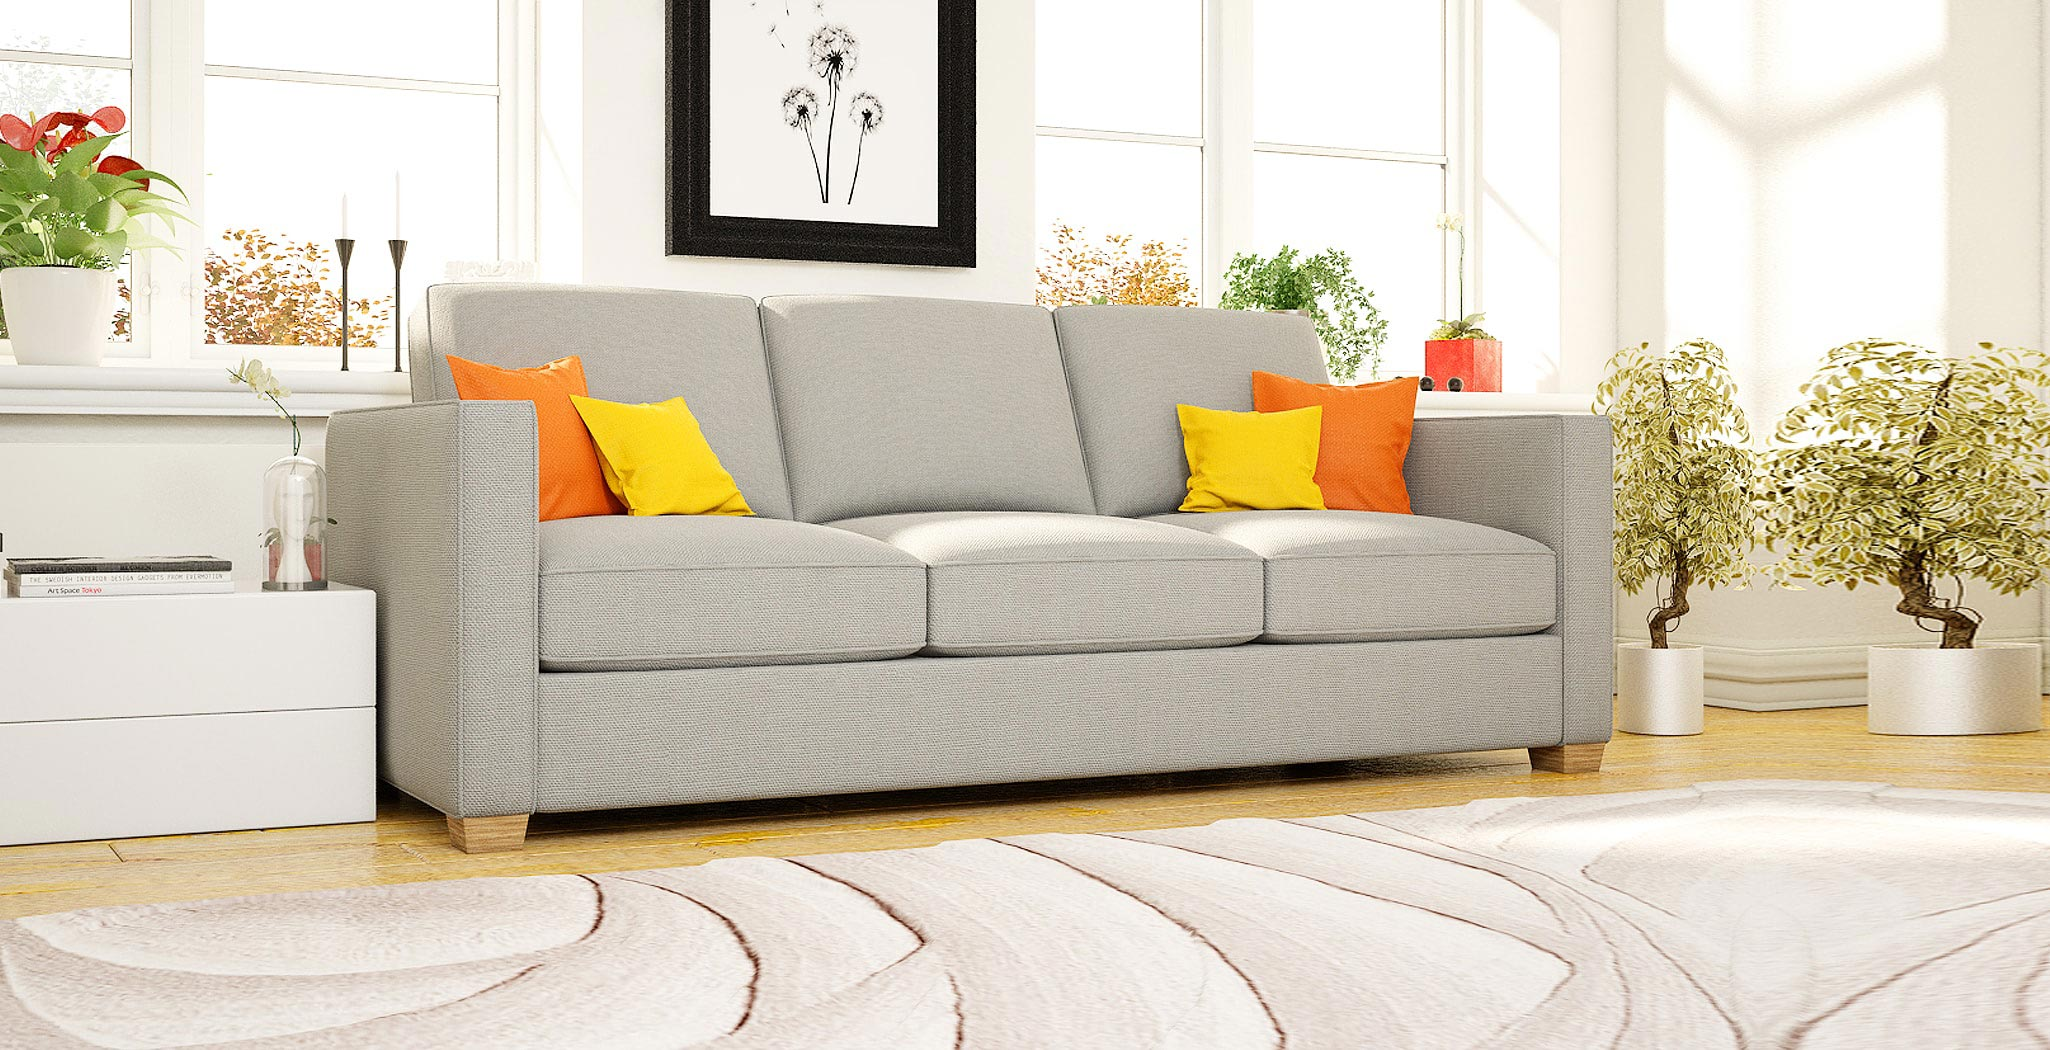 calgary sofa furniture gallery 2